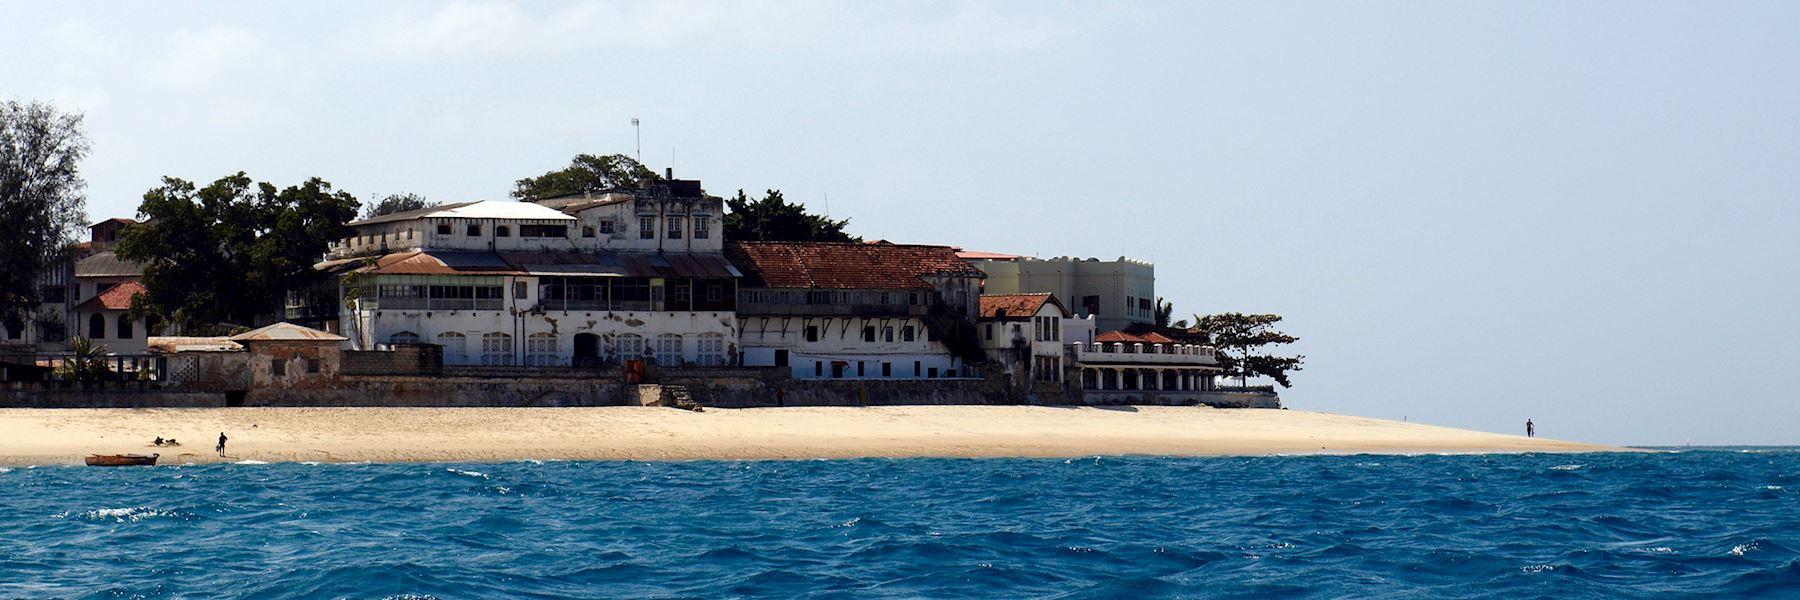 Places to visit in Zanzibar Archipelago